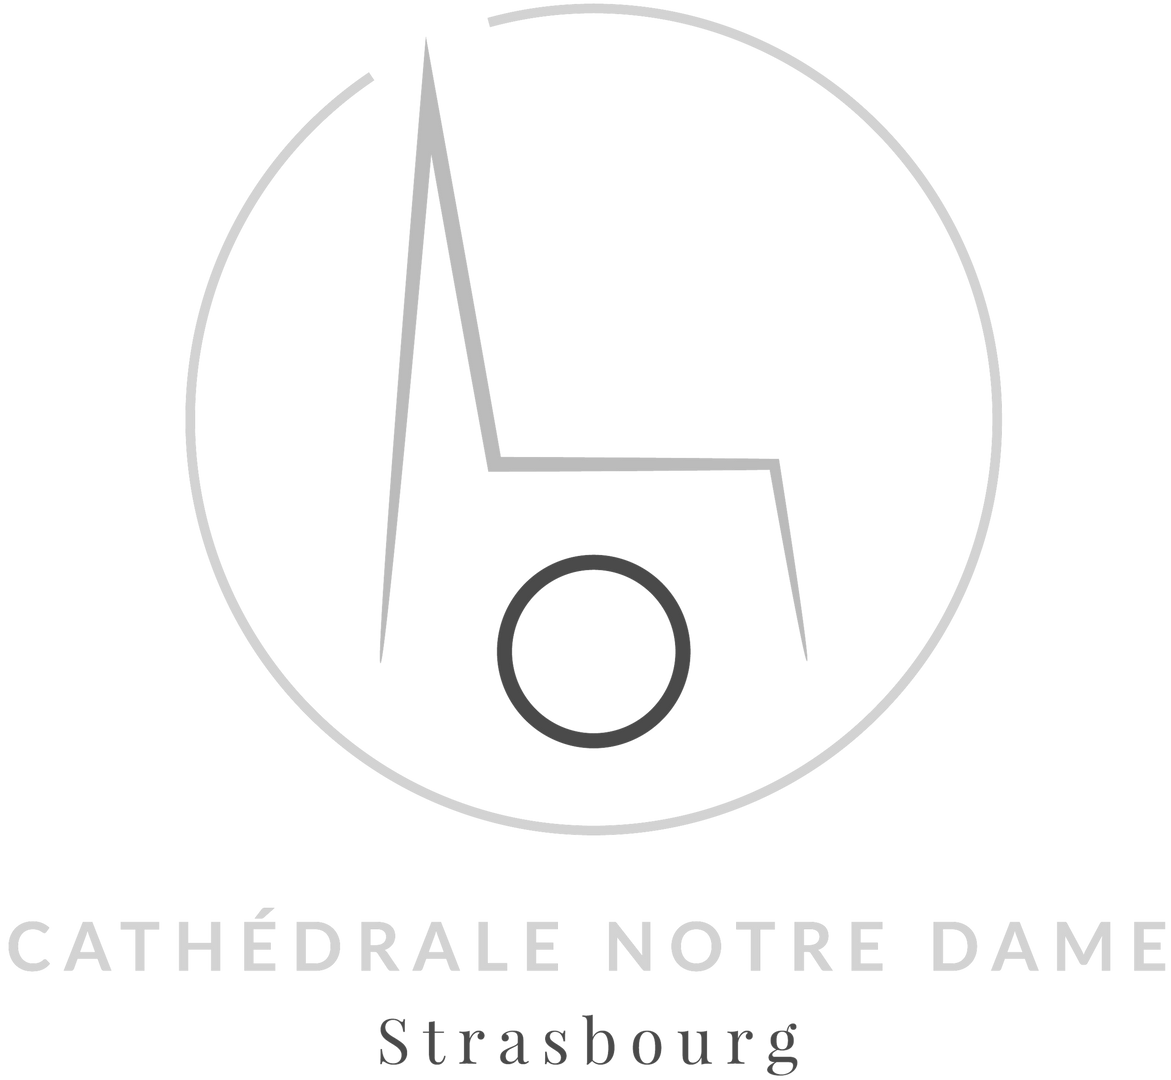 logo-cathedrale-dernier.png